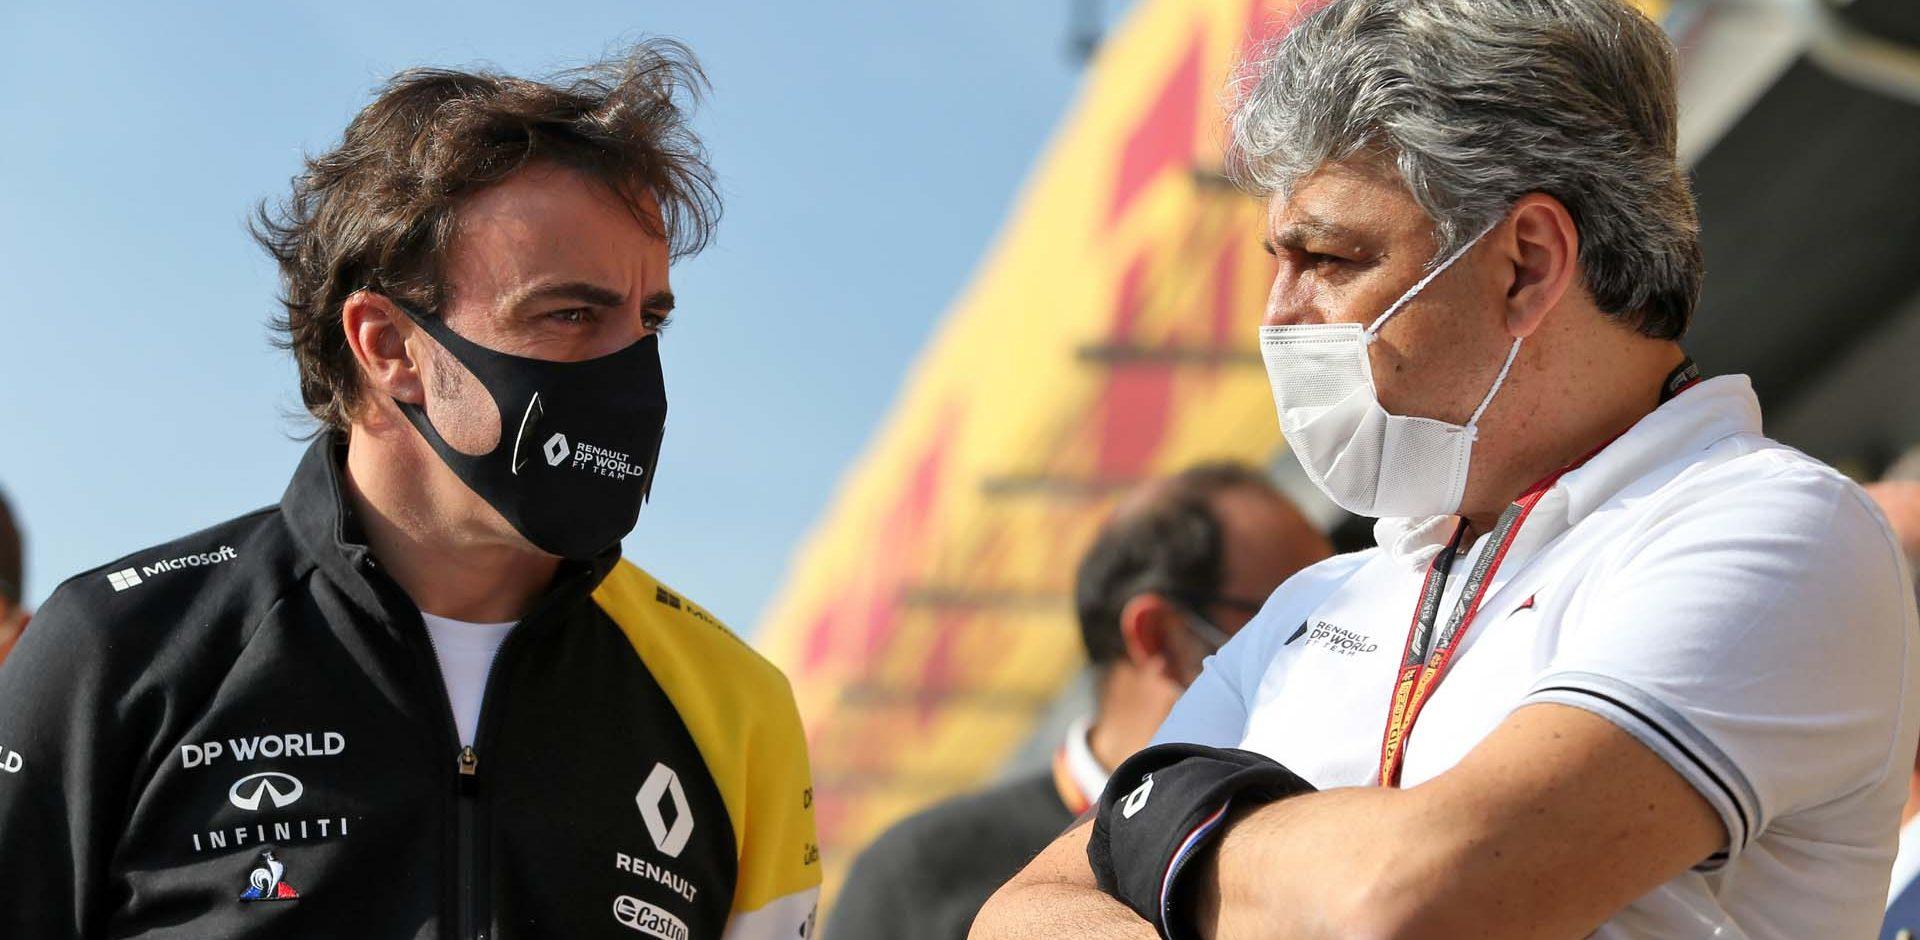 (L to R): Fernando Alonso (ESP) Renault F1 Team with Luca de Meo (ITA) Groupe Renault Chief Executive Officer. Emilia Romagna Grand Prix, Saturday 31st October 2020. Imola, Italy.